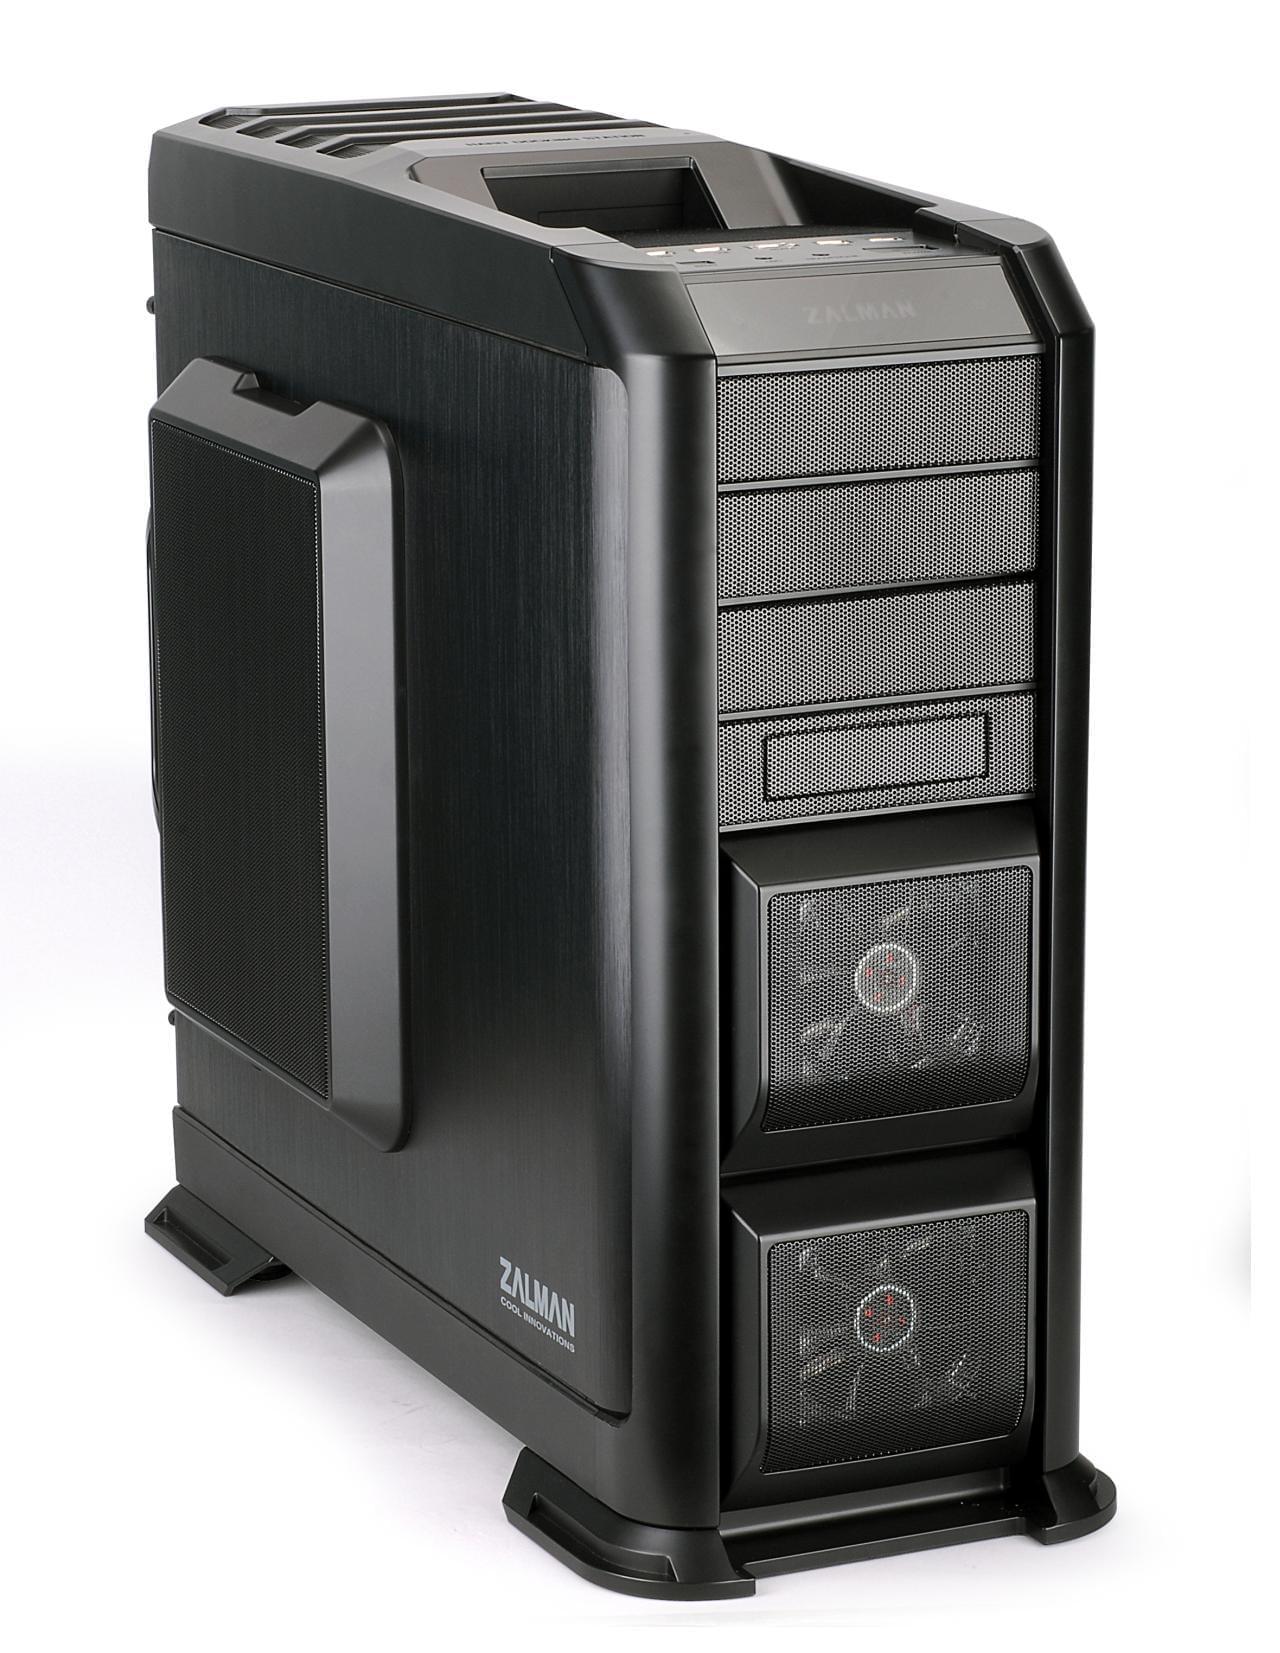 Zalman GS1200 (8809213762093) - Achat / Vente Boîtier PC sur Cybertek.fr - 0